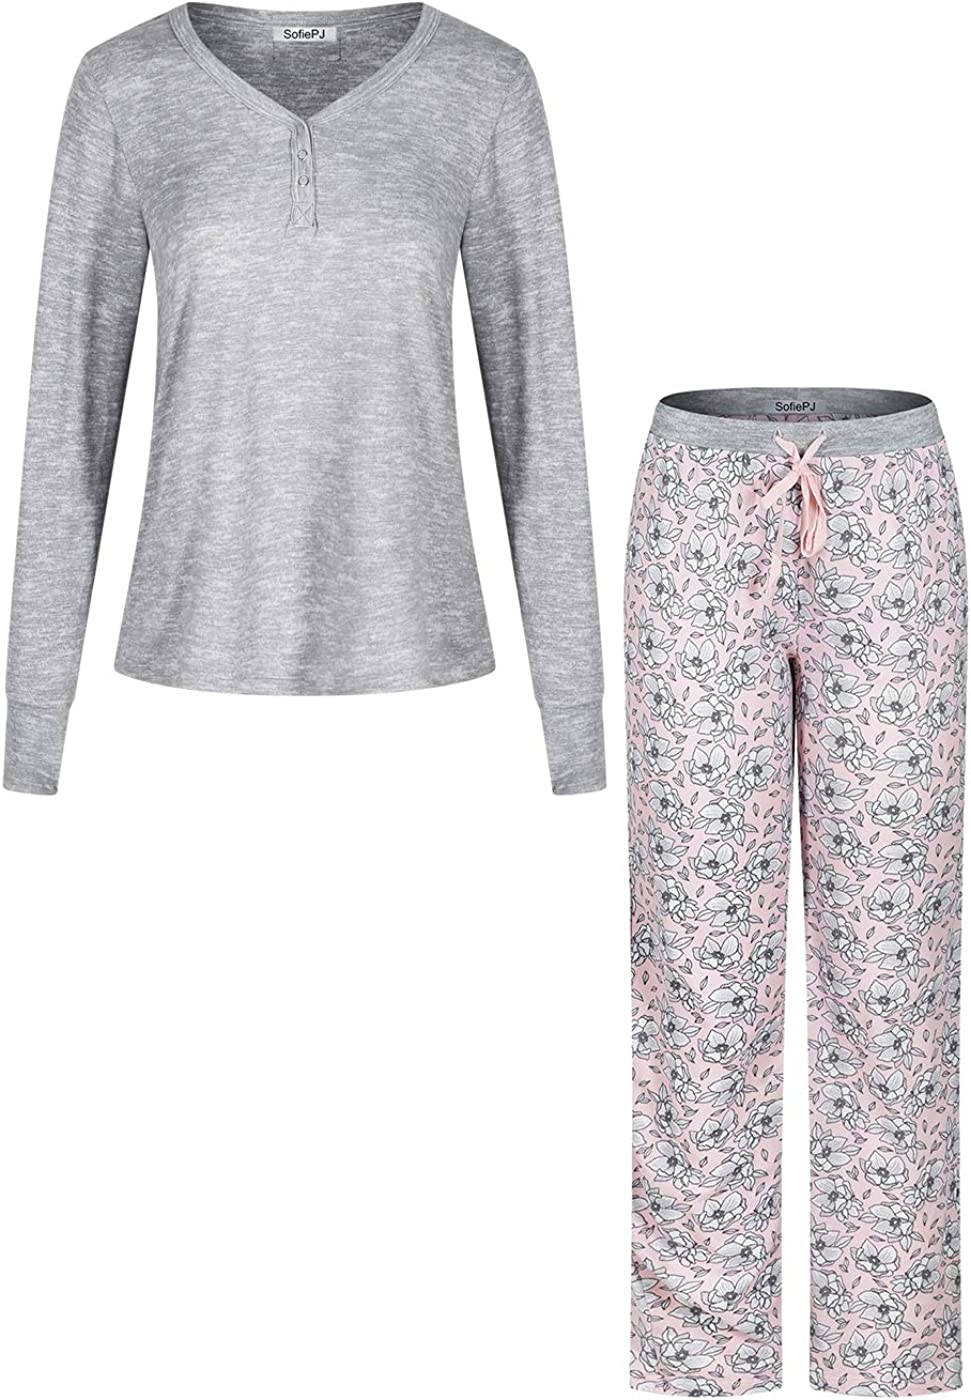 SofiePJ Women's Soft Cashmere-Like Knit All items free Regular dealer shipping Pajama Over Sleepwe Pull